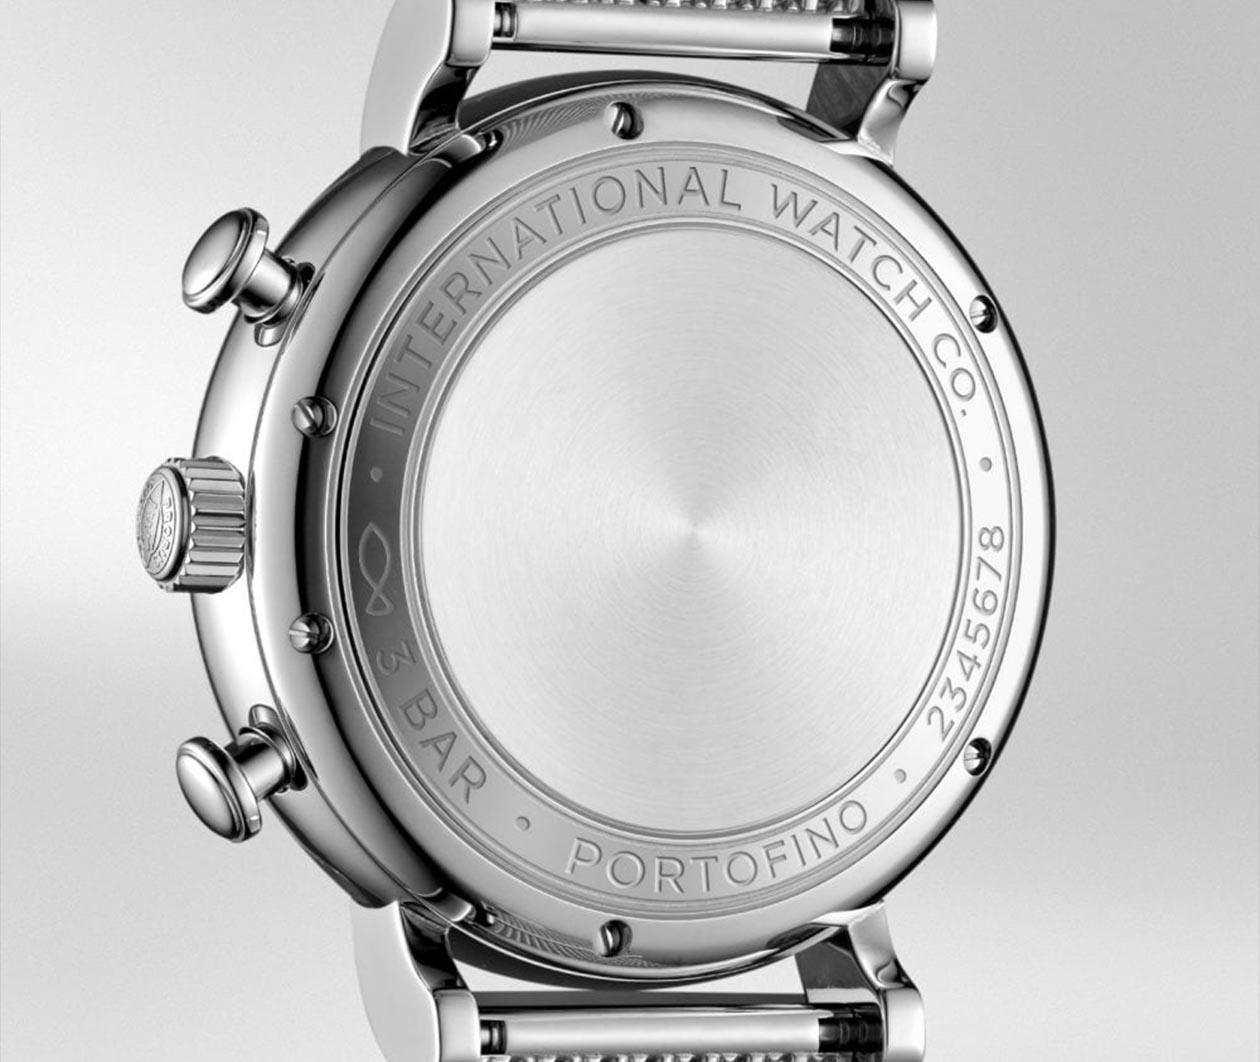 IWC Portofino Chronograph IW391028 Carousel 5 FINAL